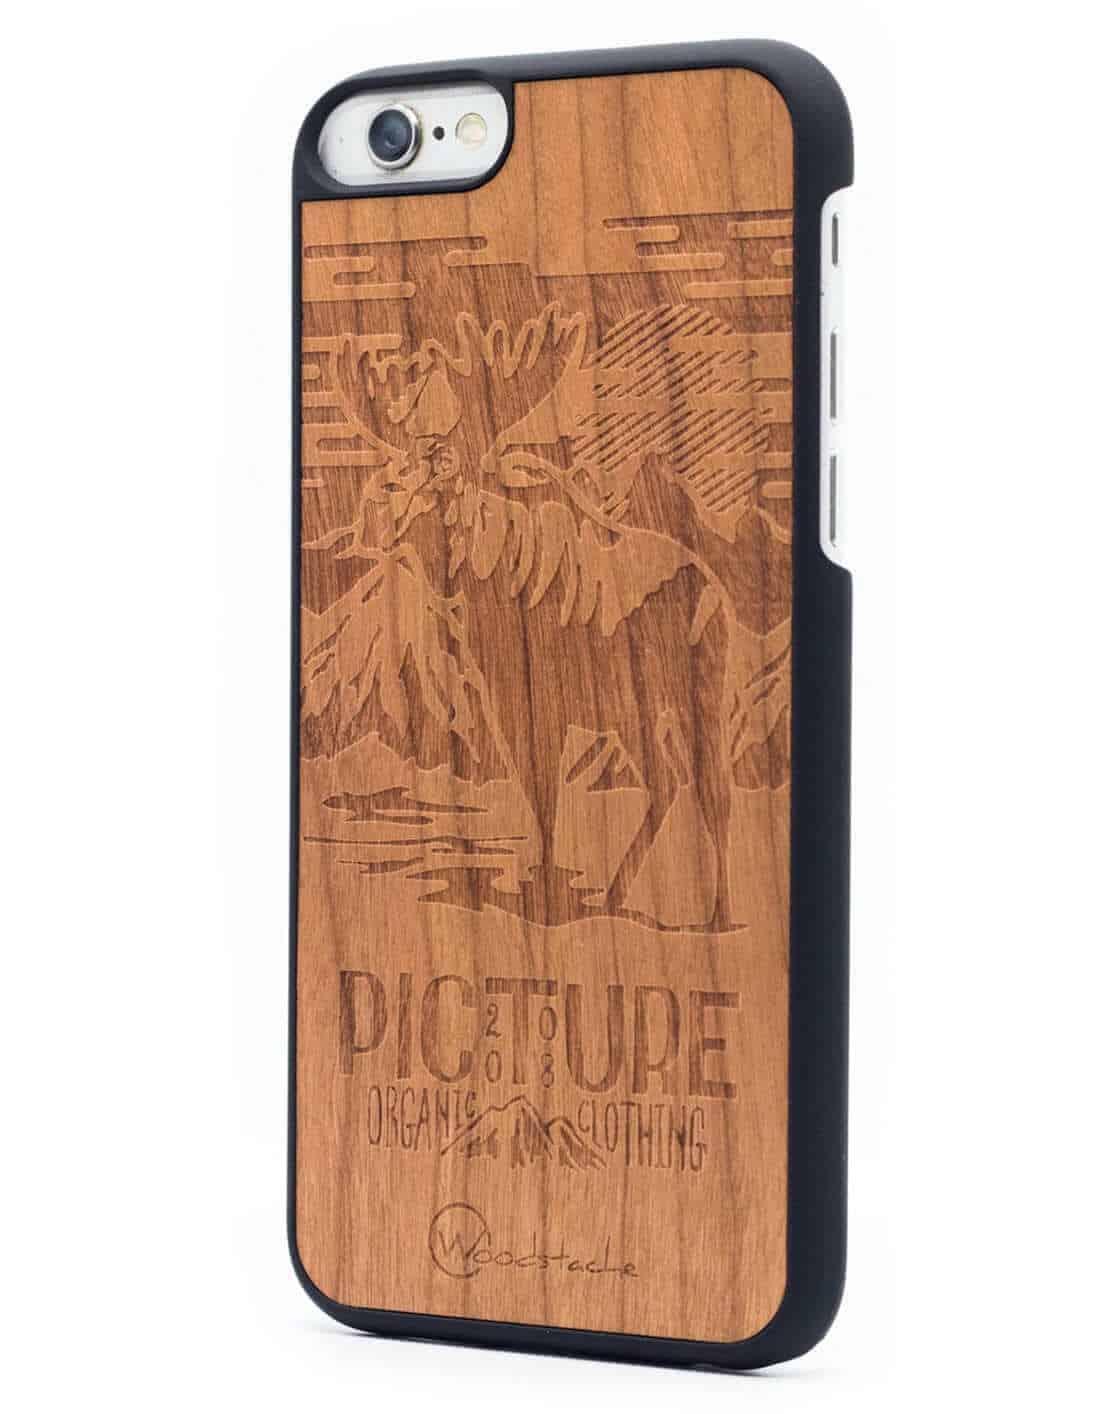 Woodstache x Picture fa iPhone 6-6s tok Moose oldalról